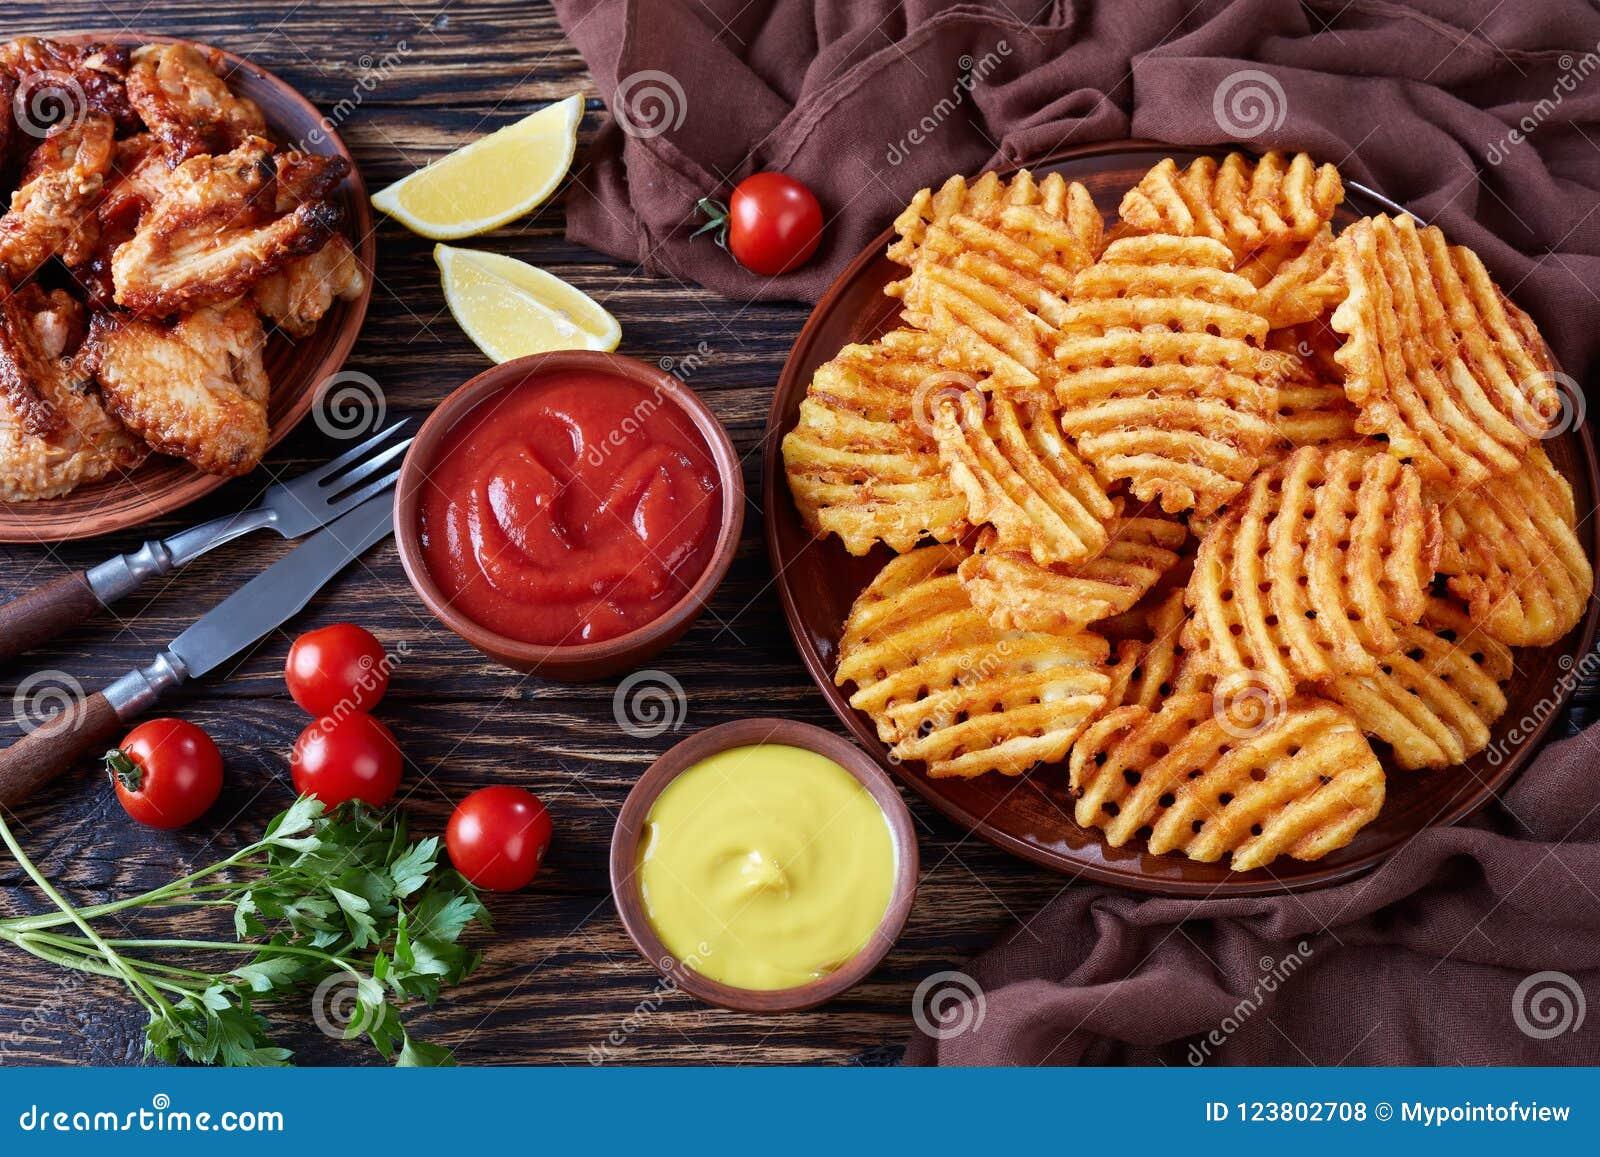 Crispy Potato Waffles Fries, Top View Stock Photo - Image of